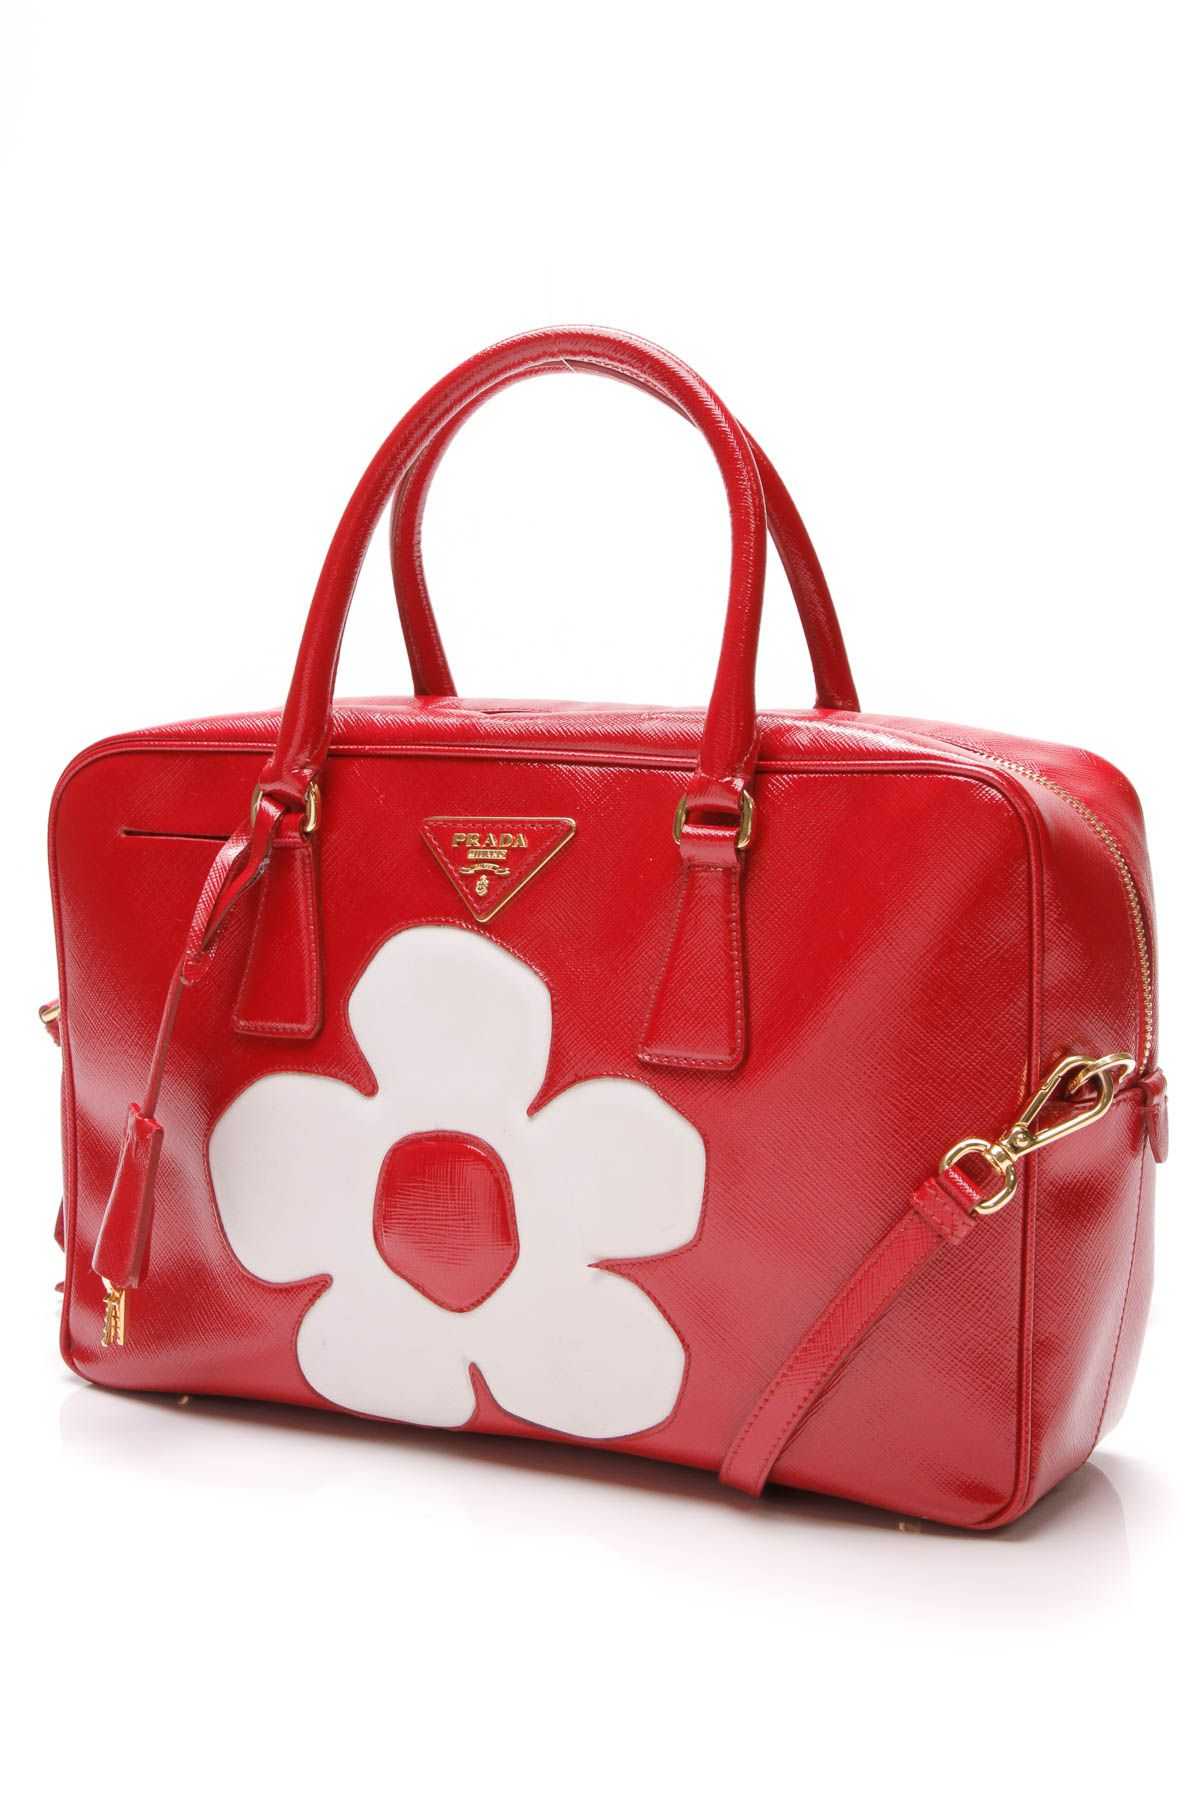 d6d9cadb36d5 Bauletto Flower Satchel Bag - Patent Saffiano Leather   Things I ...